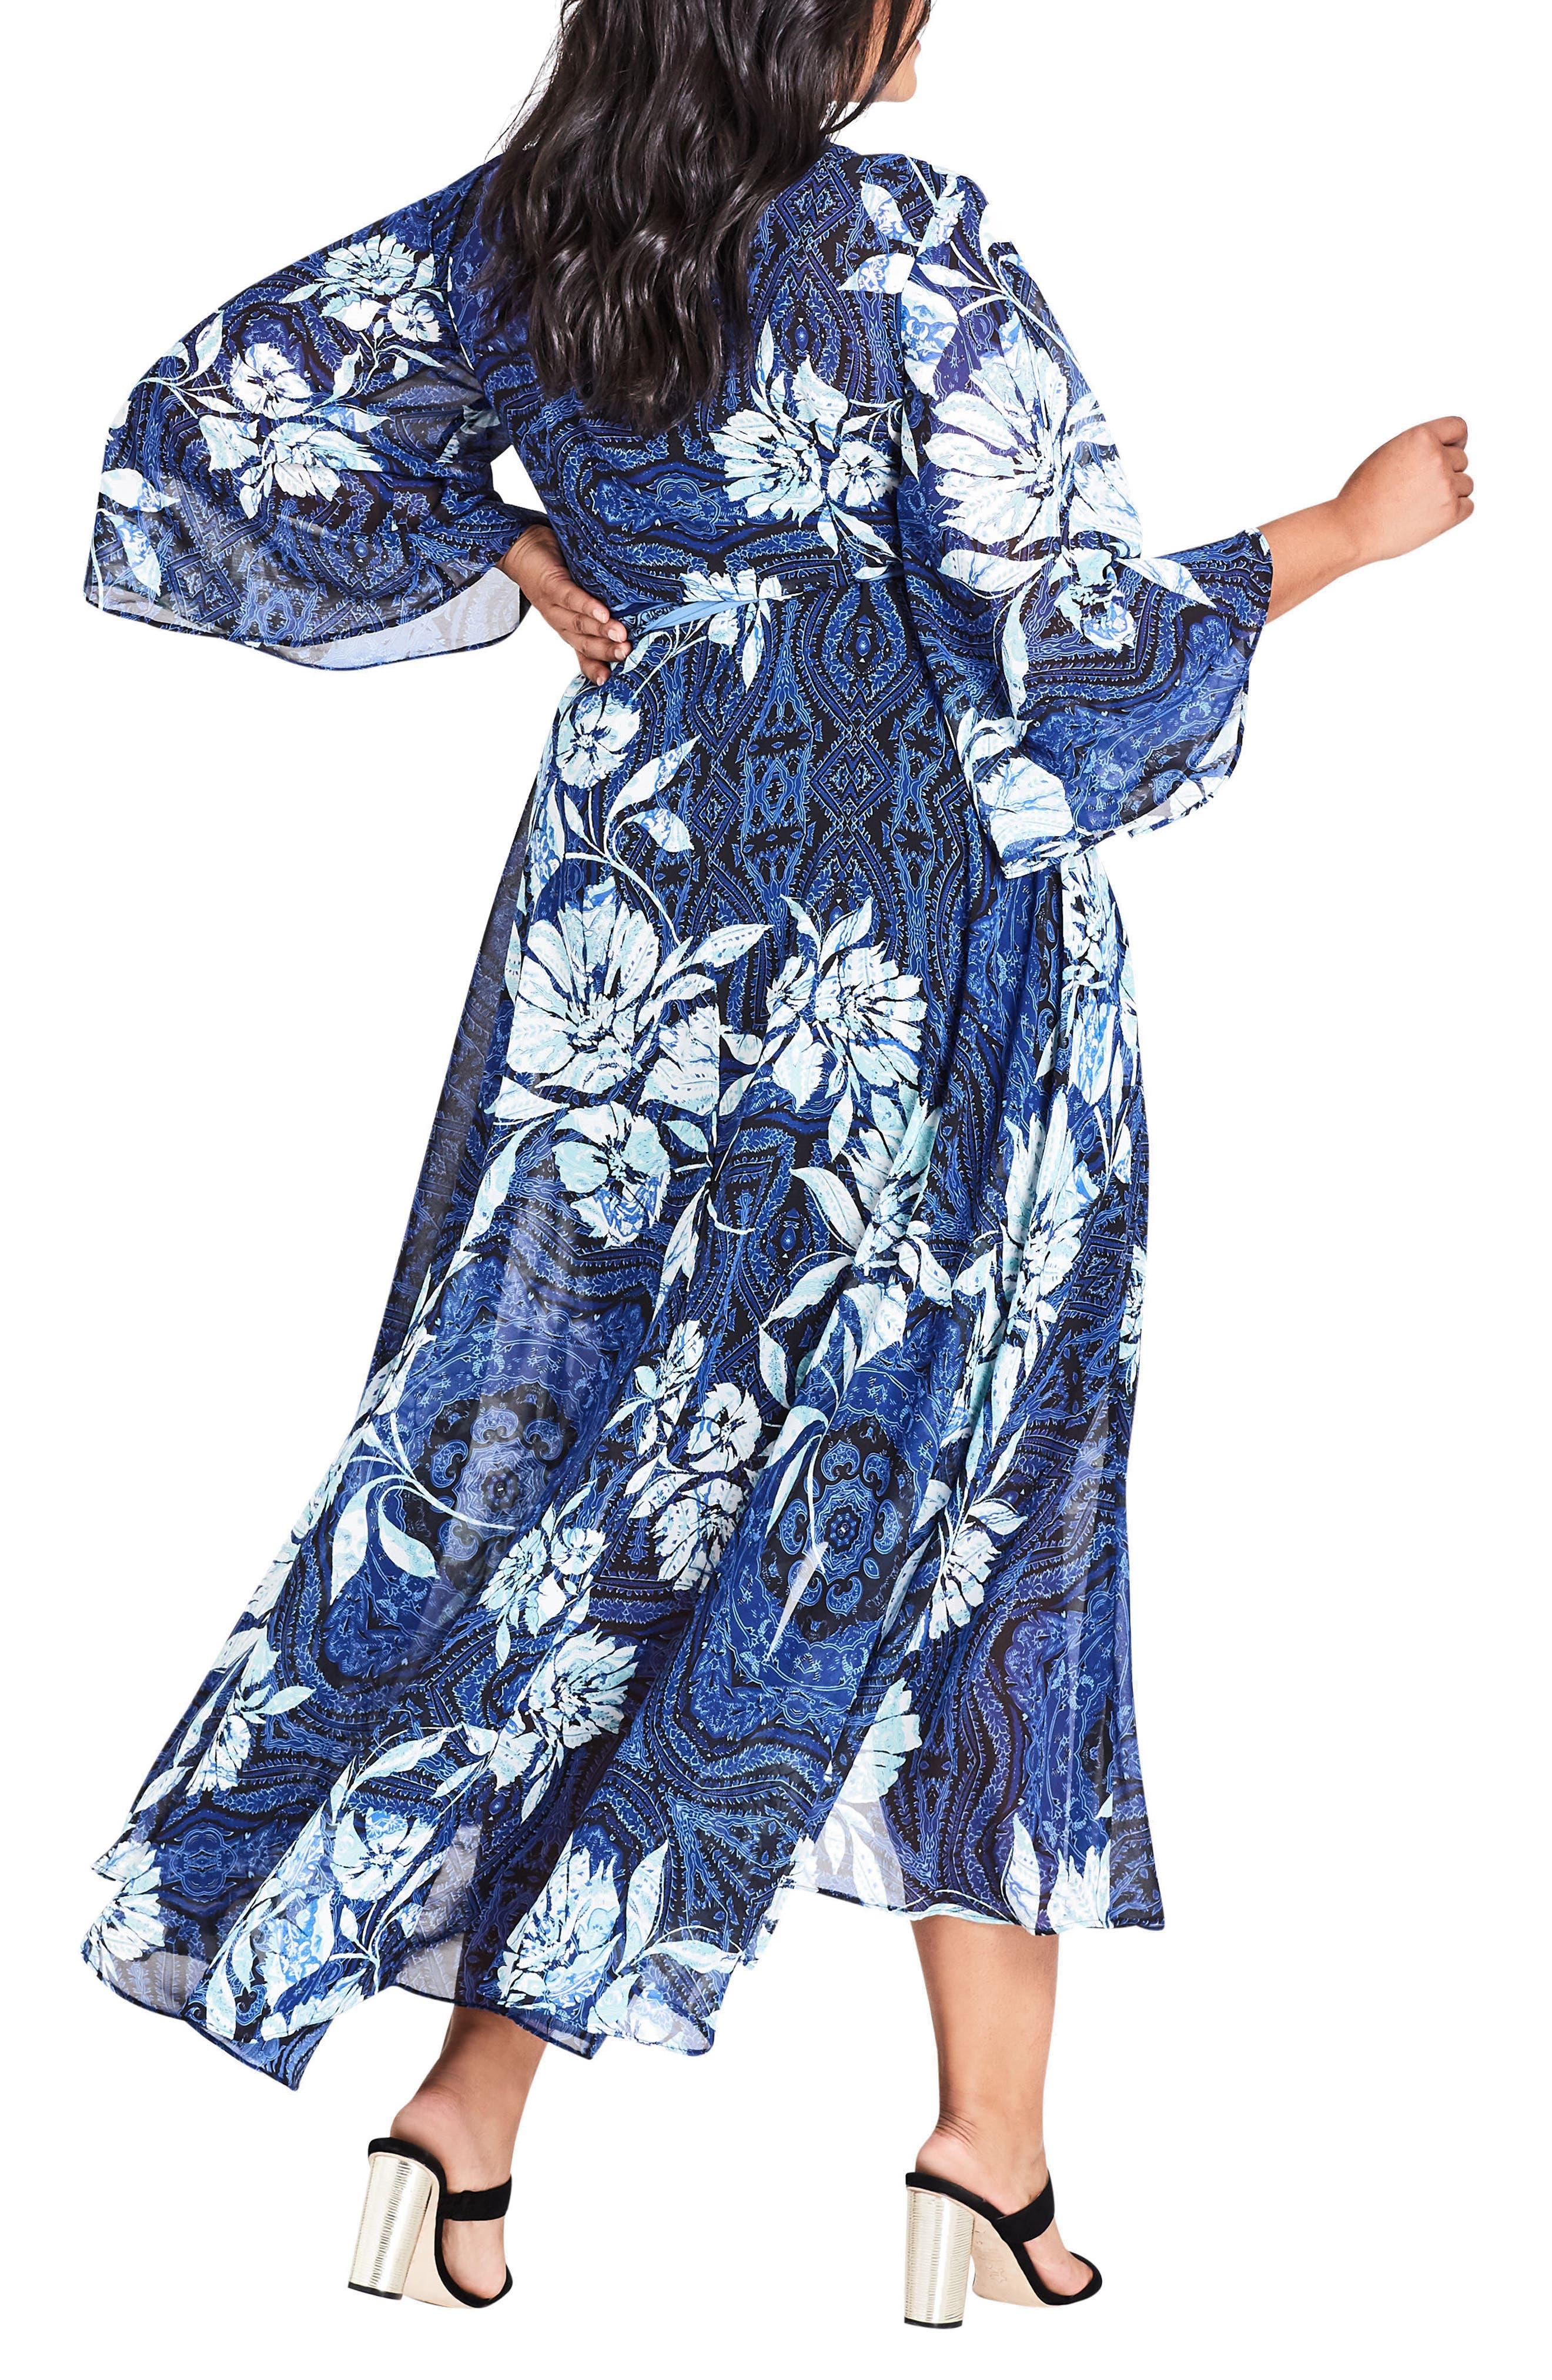 Blue Illusion High/Low Wrap Dress,                             Alternate thumbnail 2, color,                             Blue Illusion